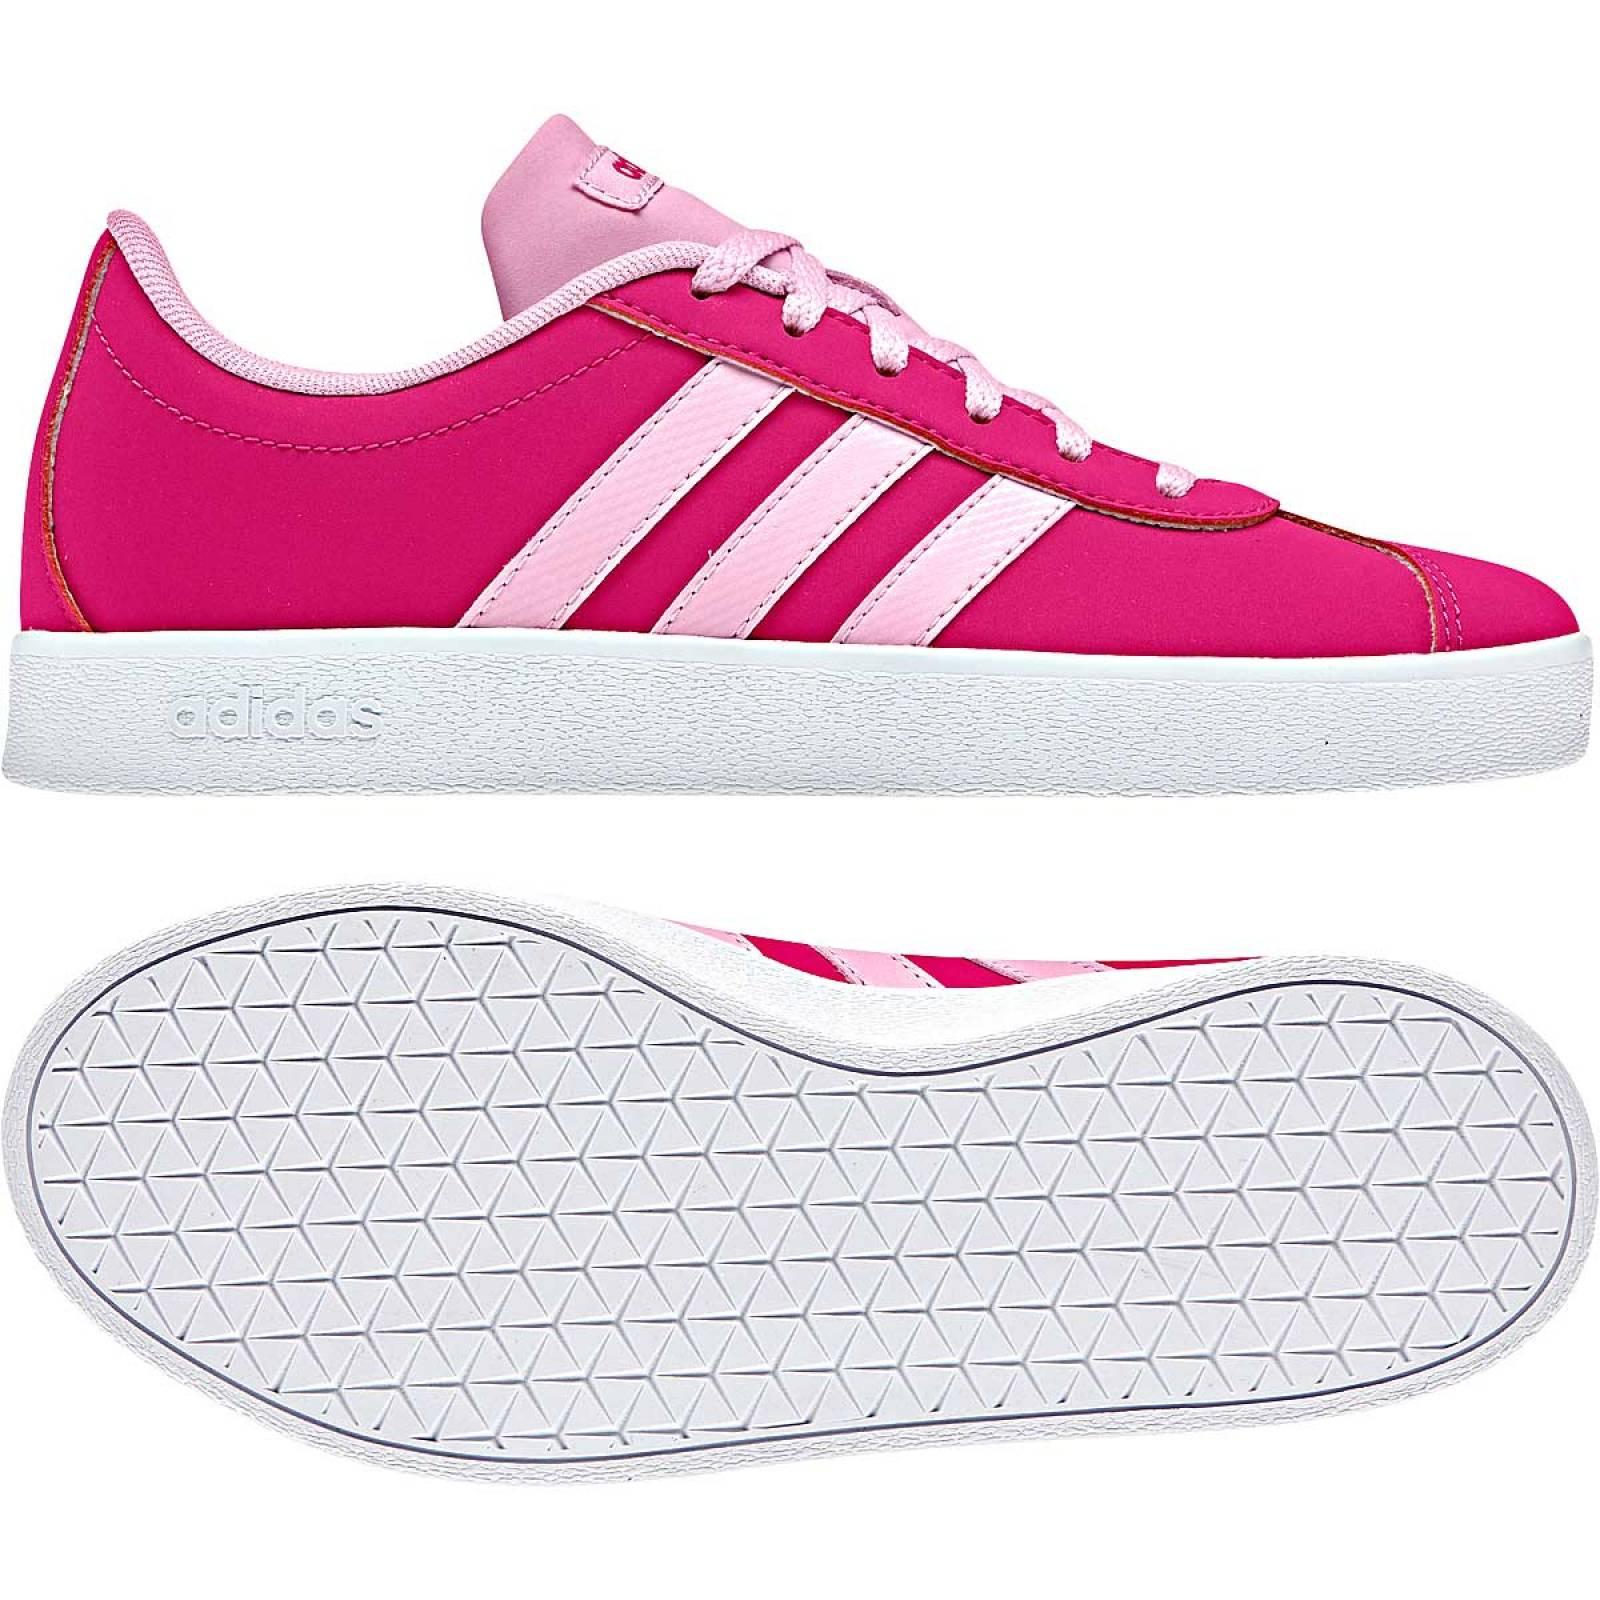 Adidas Tenis Mujer Fiusha rosa